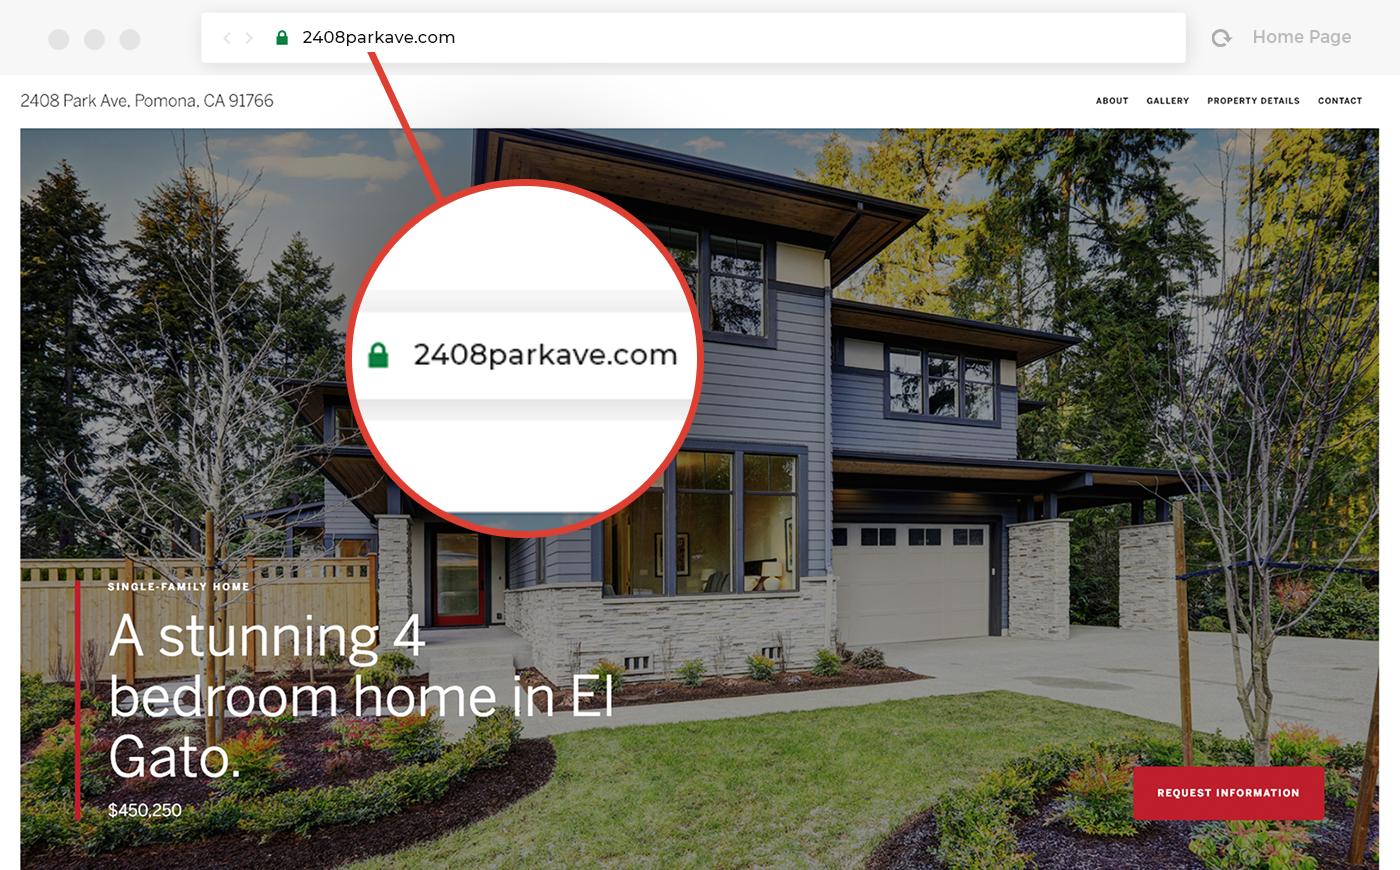 Custom domain to better market your listing